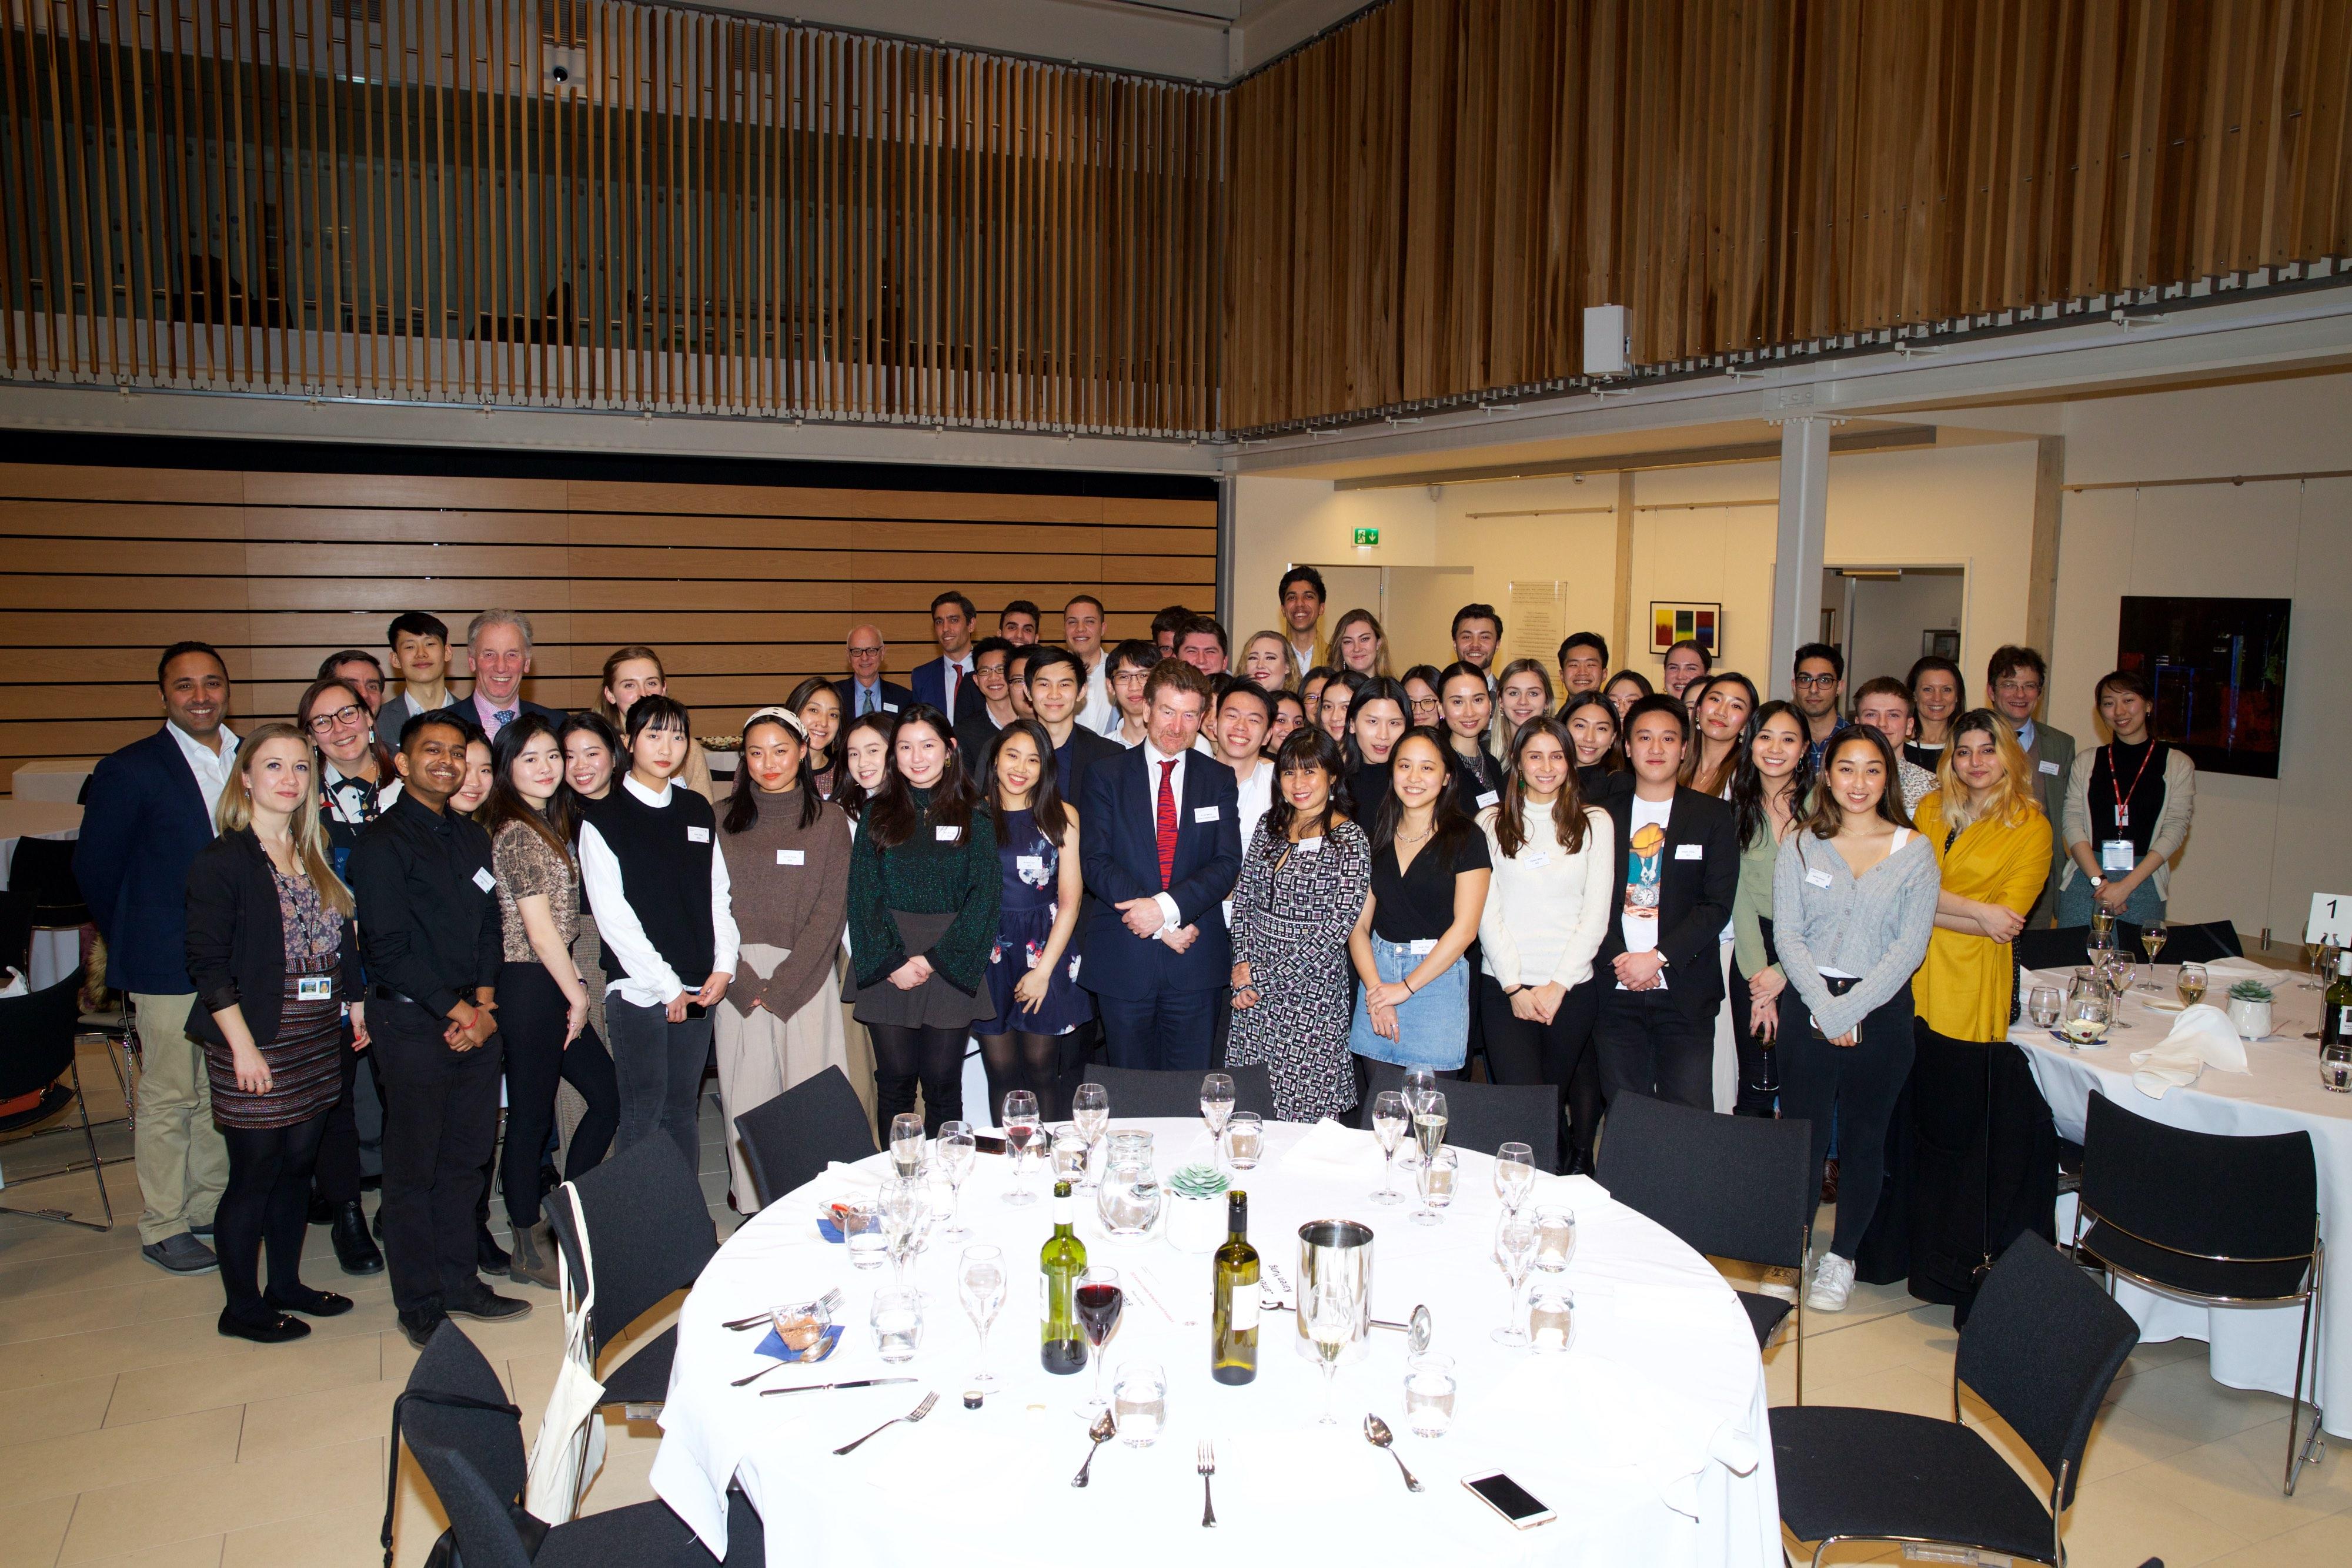 DCI alumni gather in London